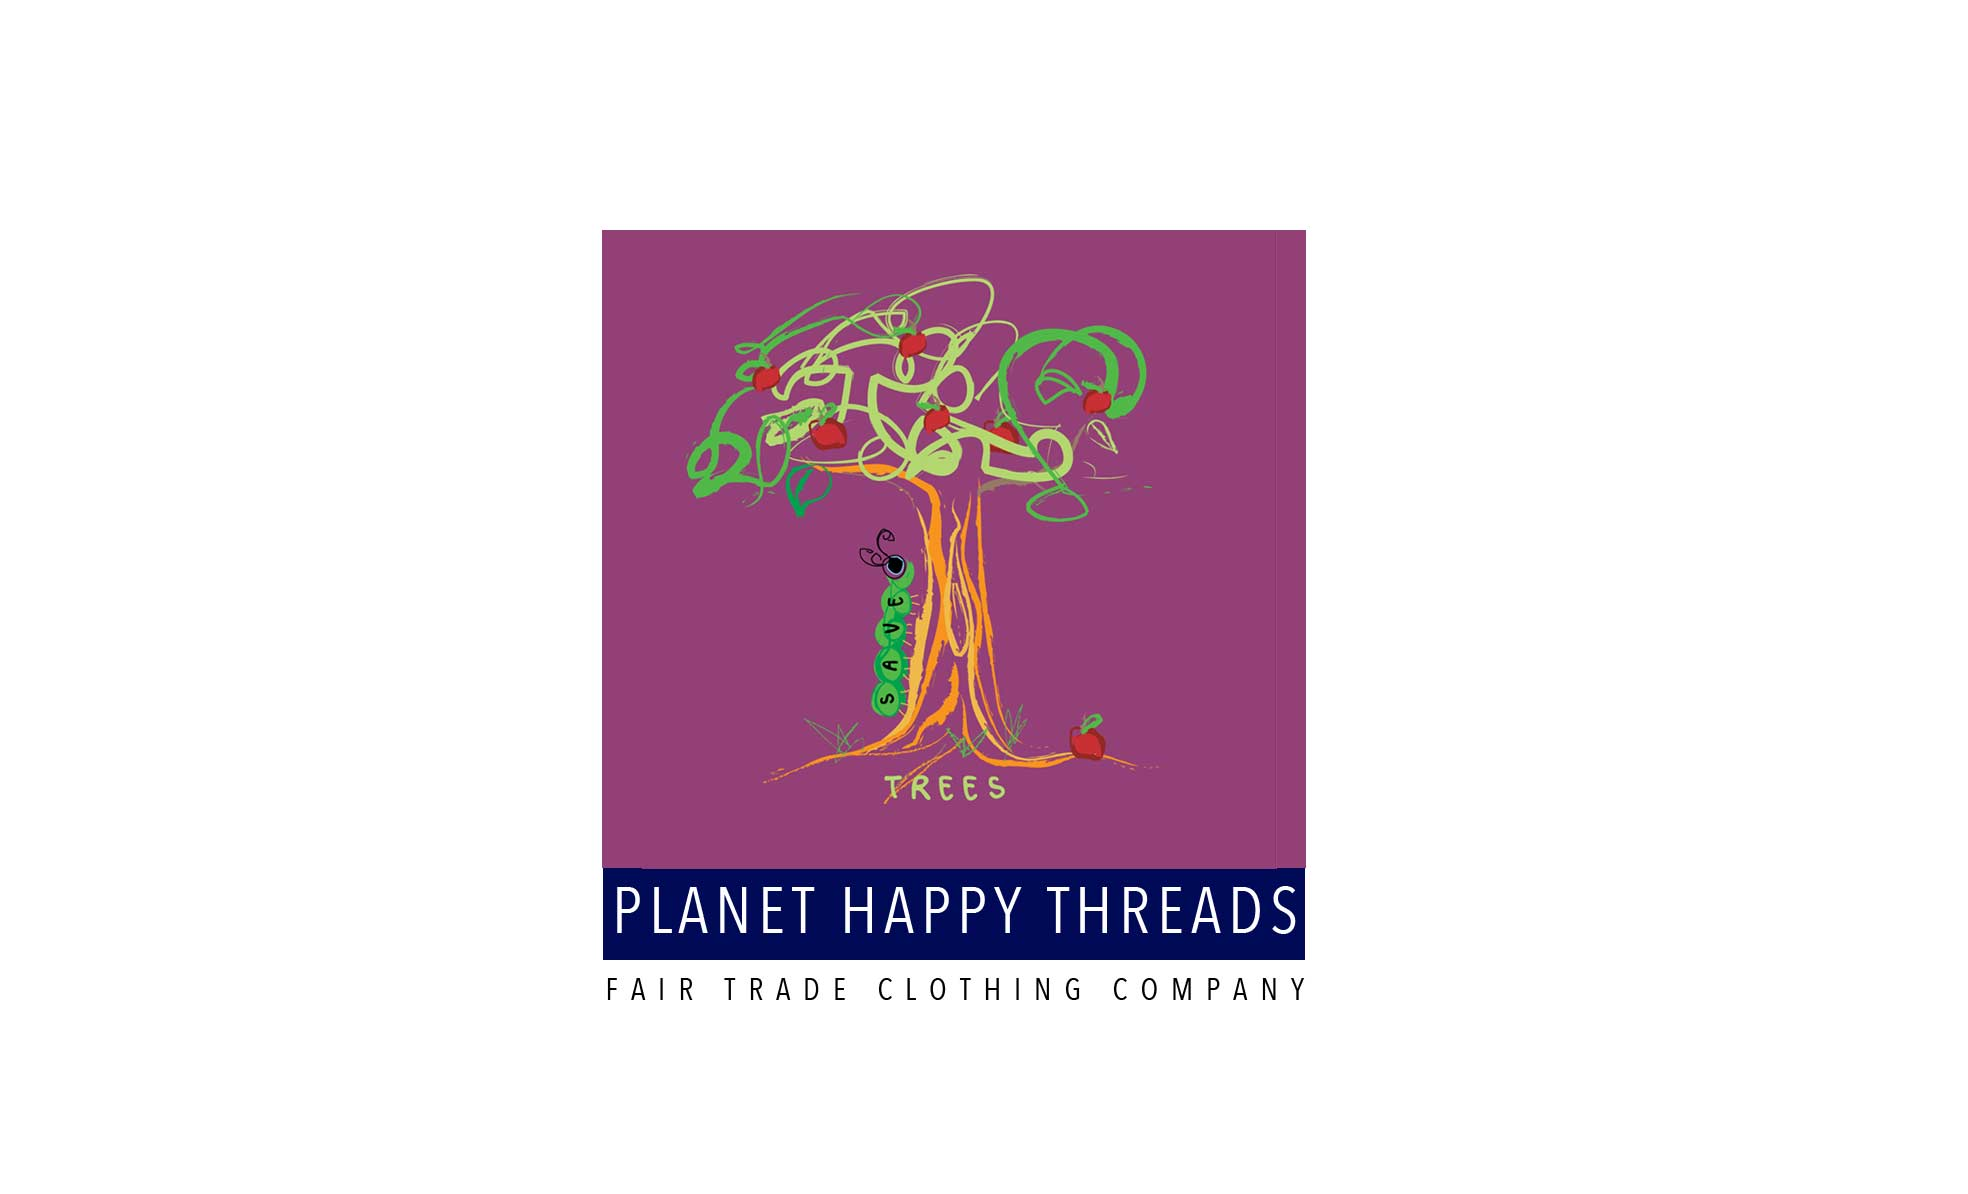 planet-happy-threads-logo-design4-web